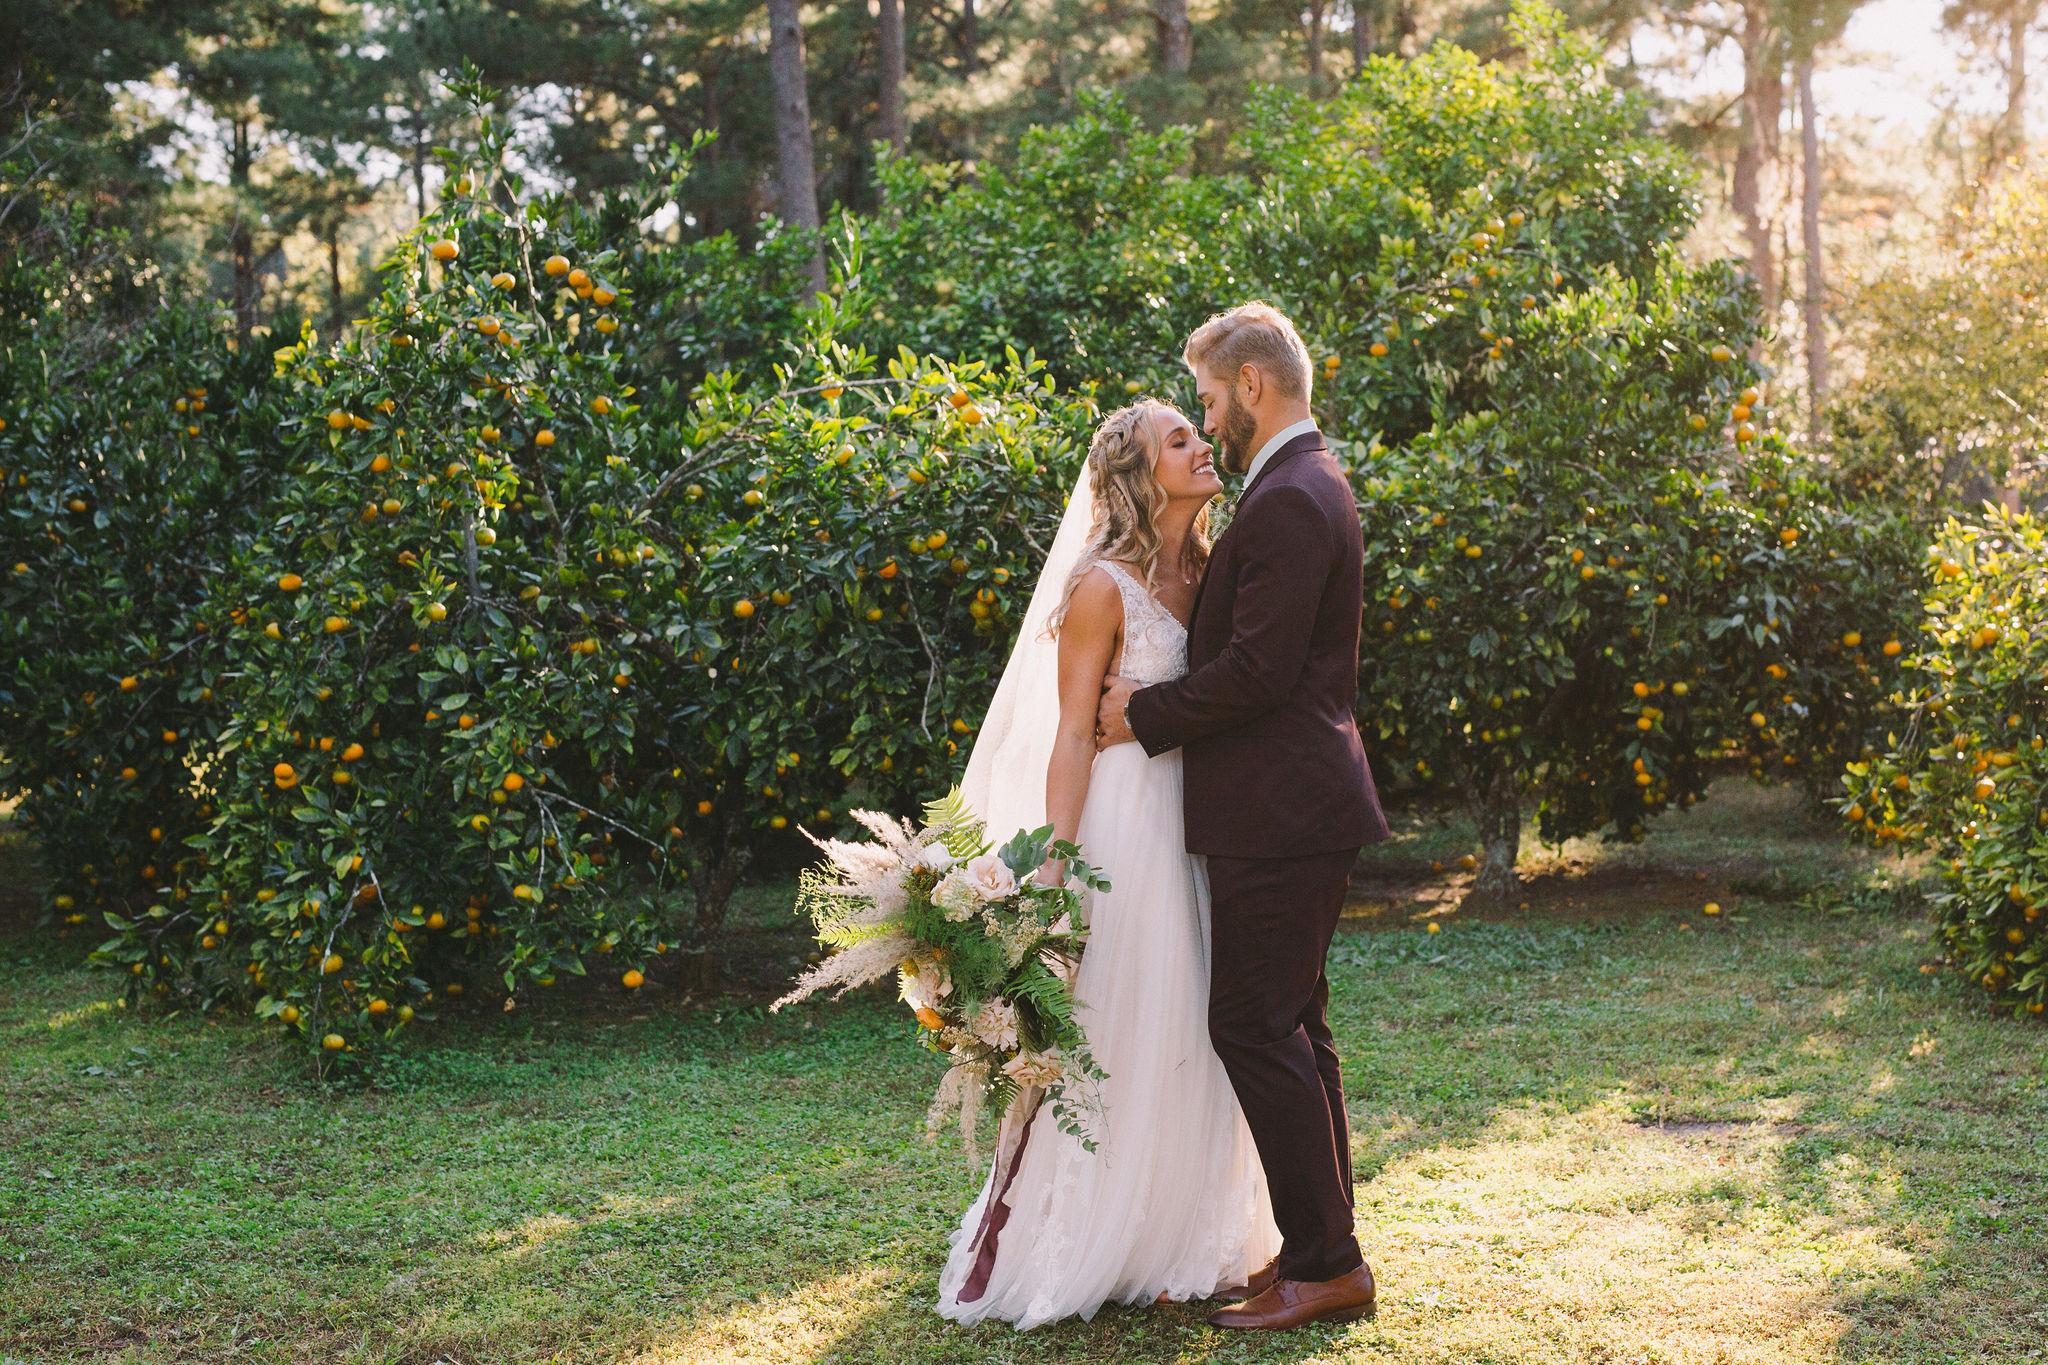 Jesseandlex_181103_AlexisNate_Wedding_BrideGroom_027.jpg